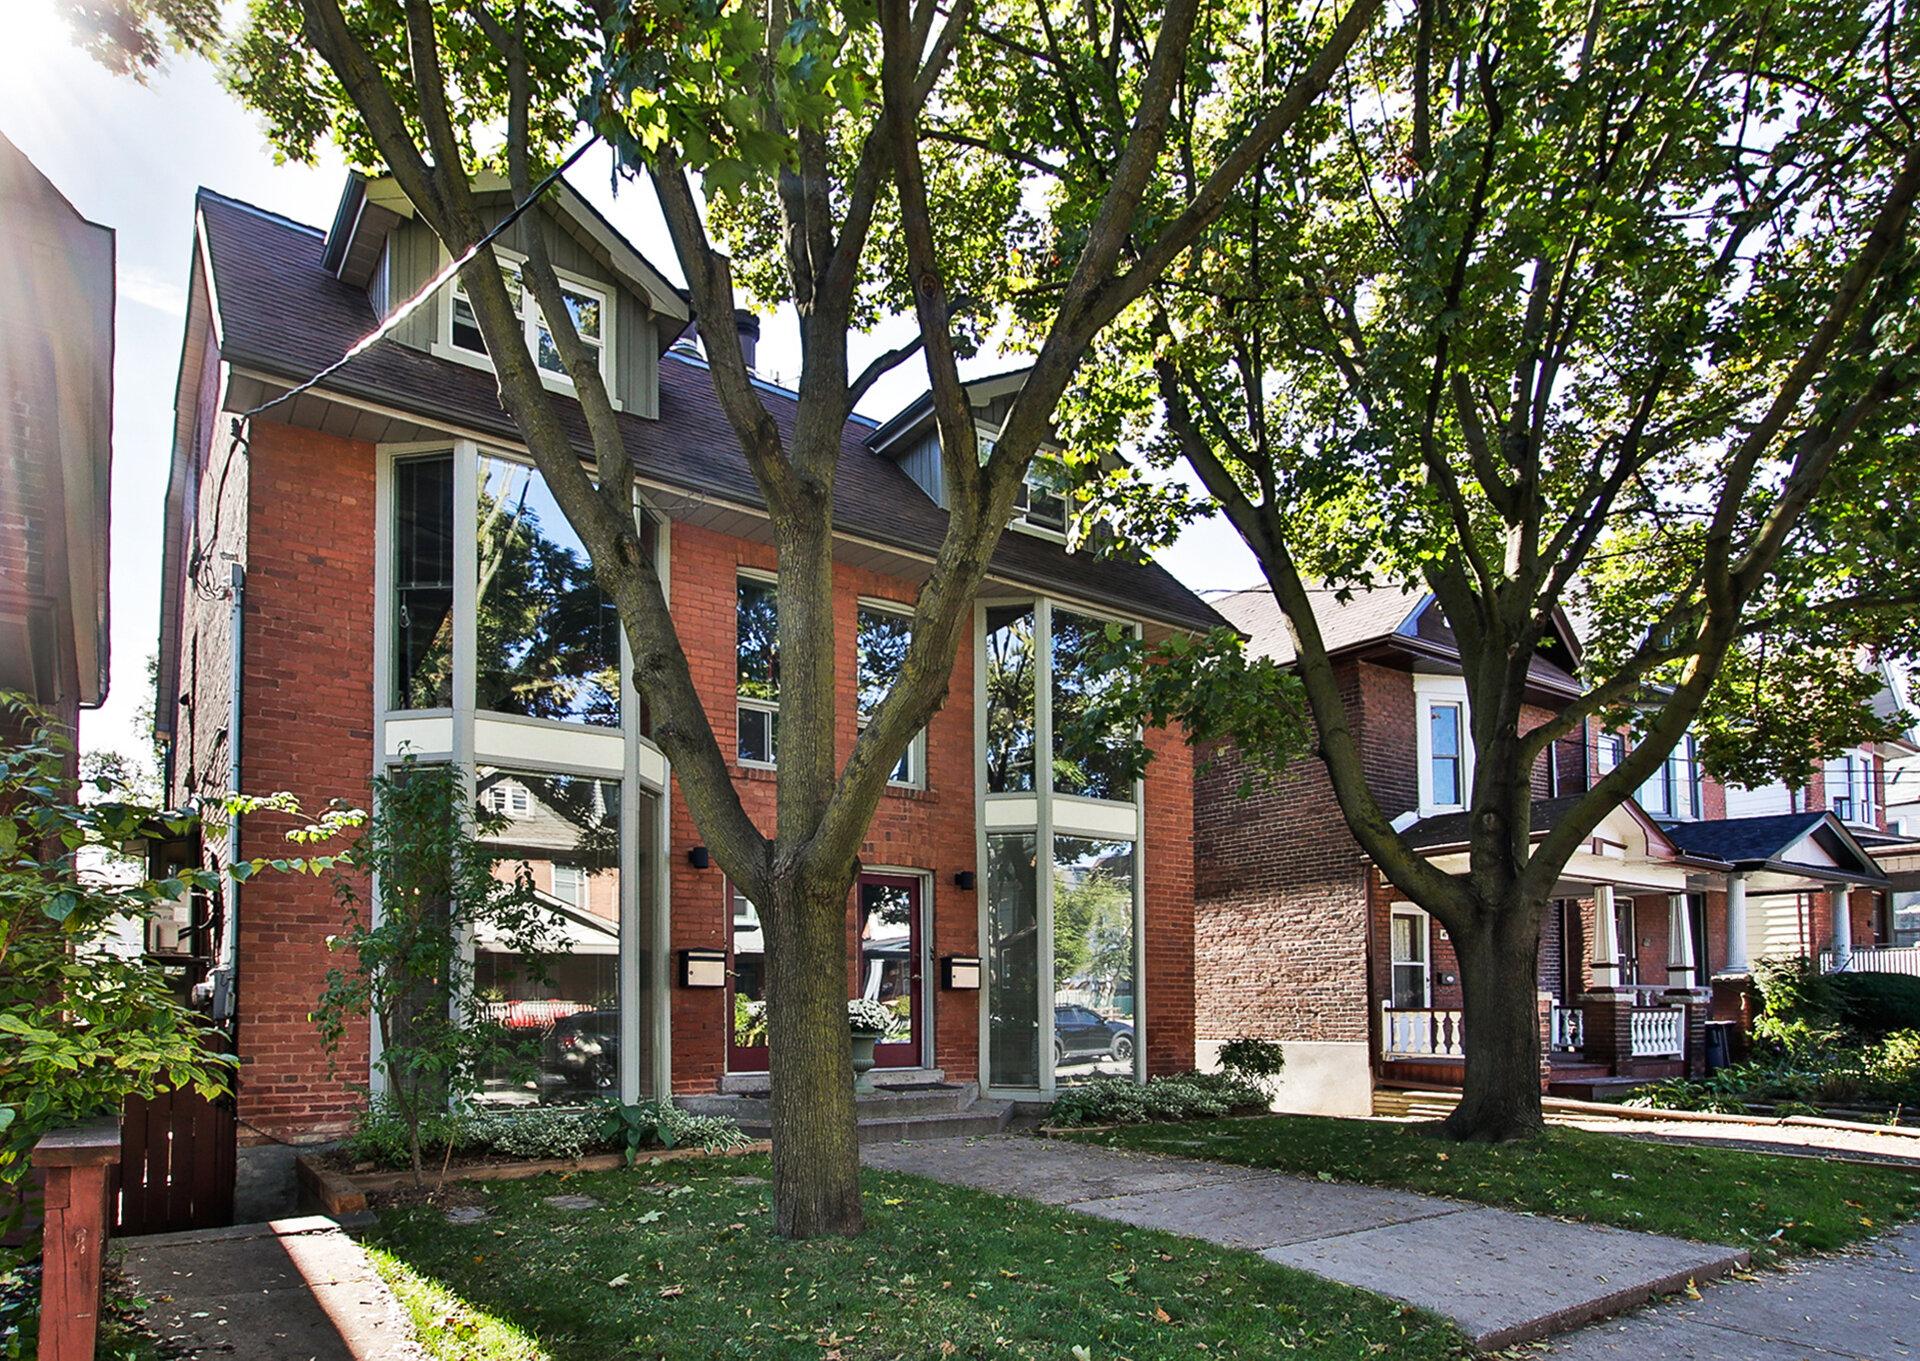 51 Harcourt Ave - $1,149,000